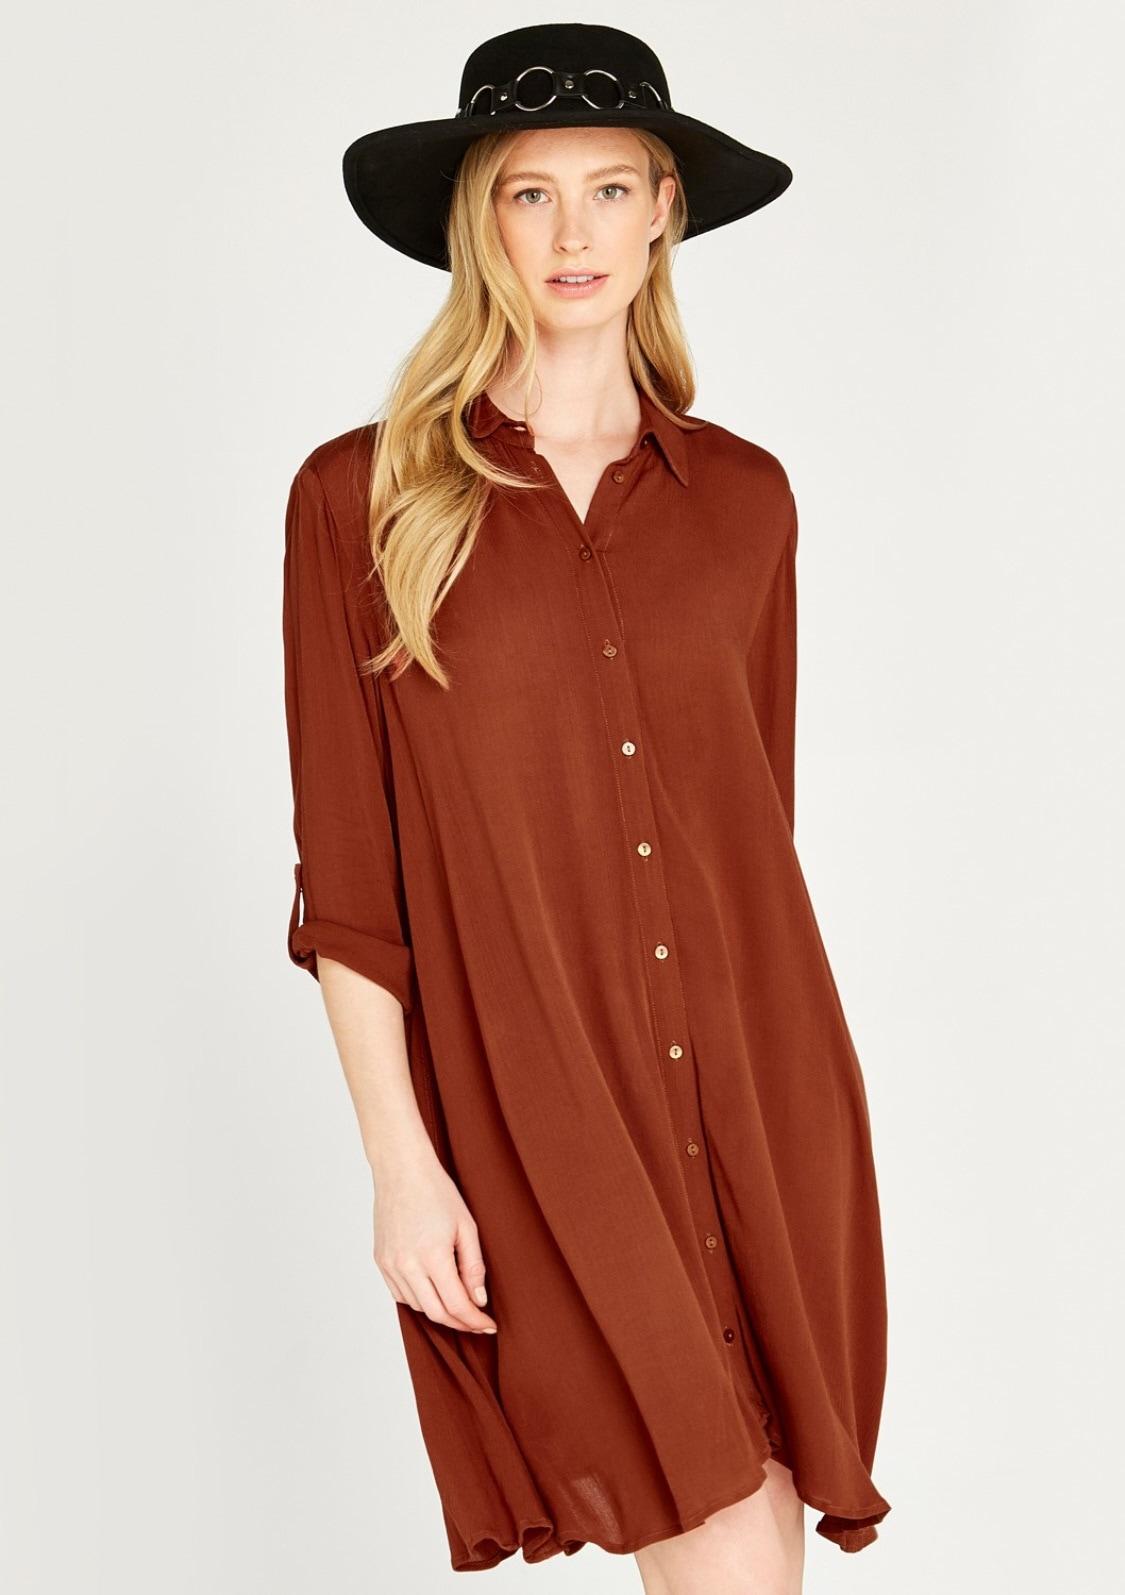 Image of Apricot Hemdblusenkleid »Crinkle Viscose Swing Shirt Dress«